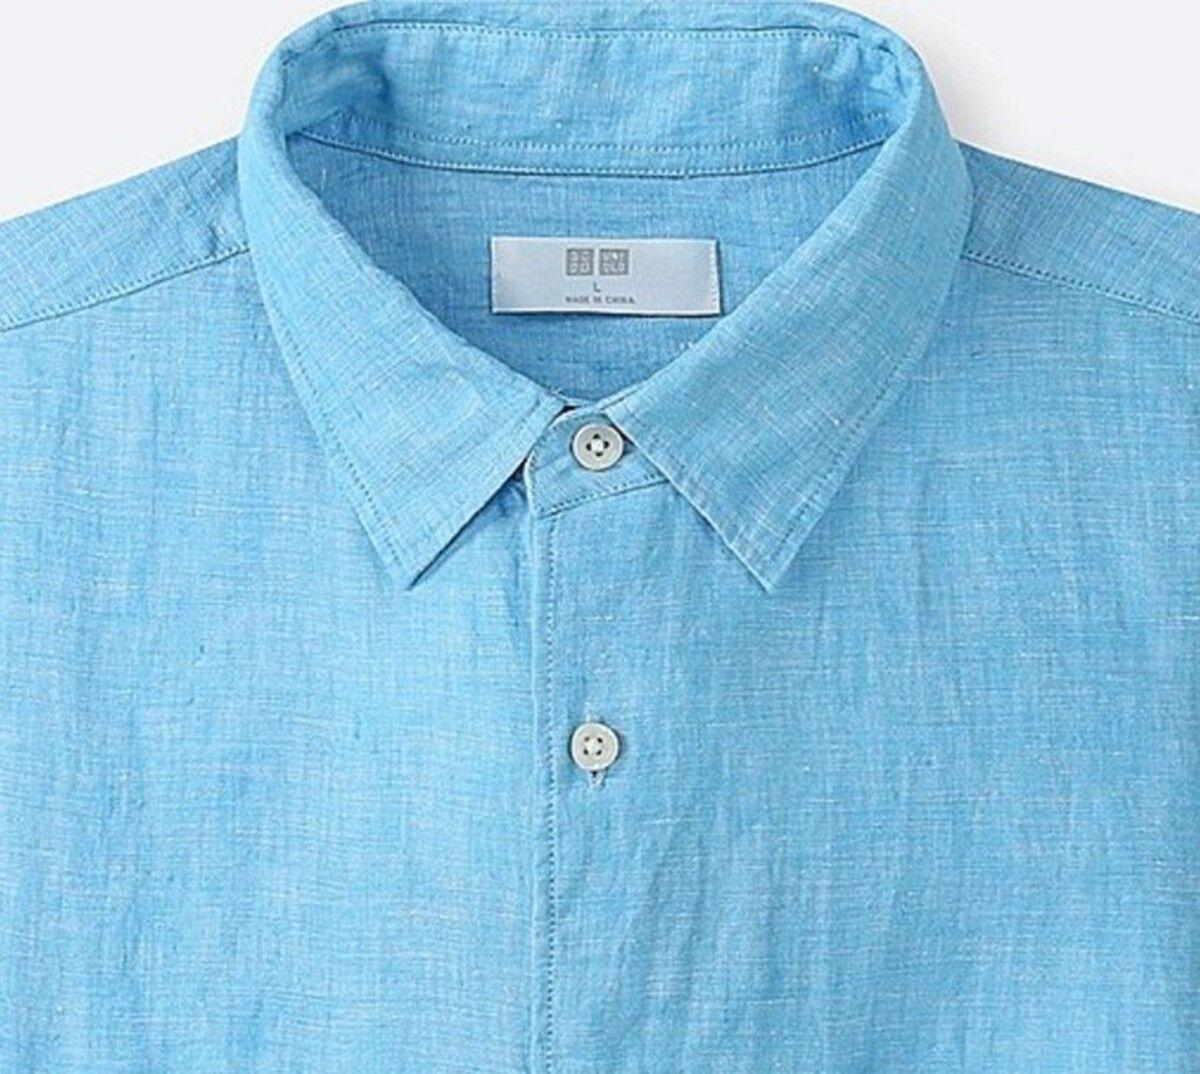 UNIQLO Men's 100% Premium French Linen Long-Sleeve Shirt L blueE (63) NWT